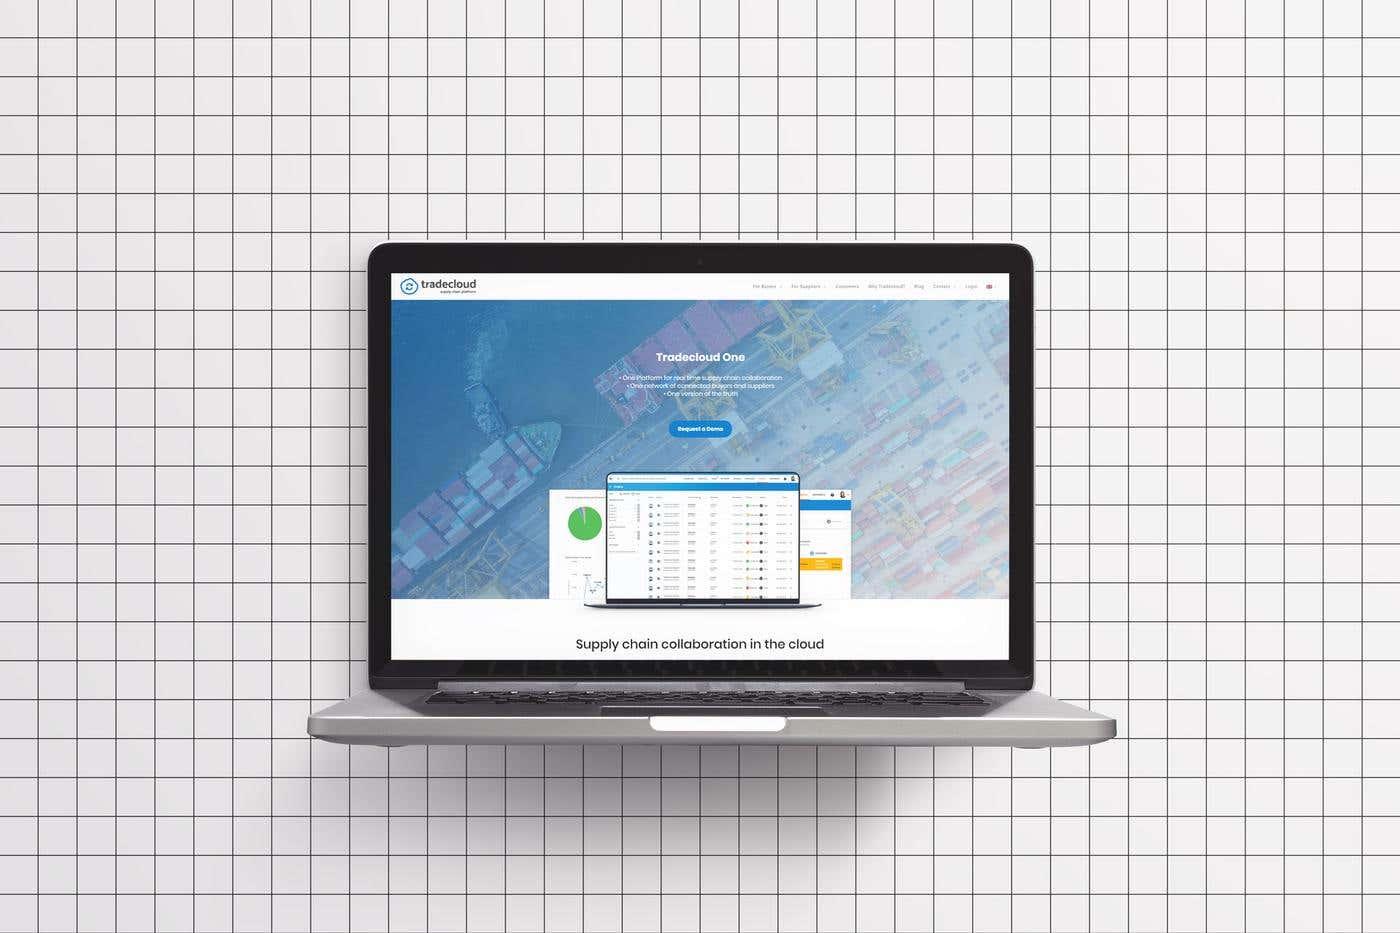 macbook-pro-2015-psd-mockup-copy.jpg